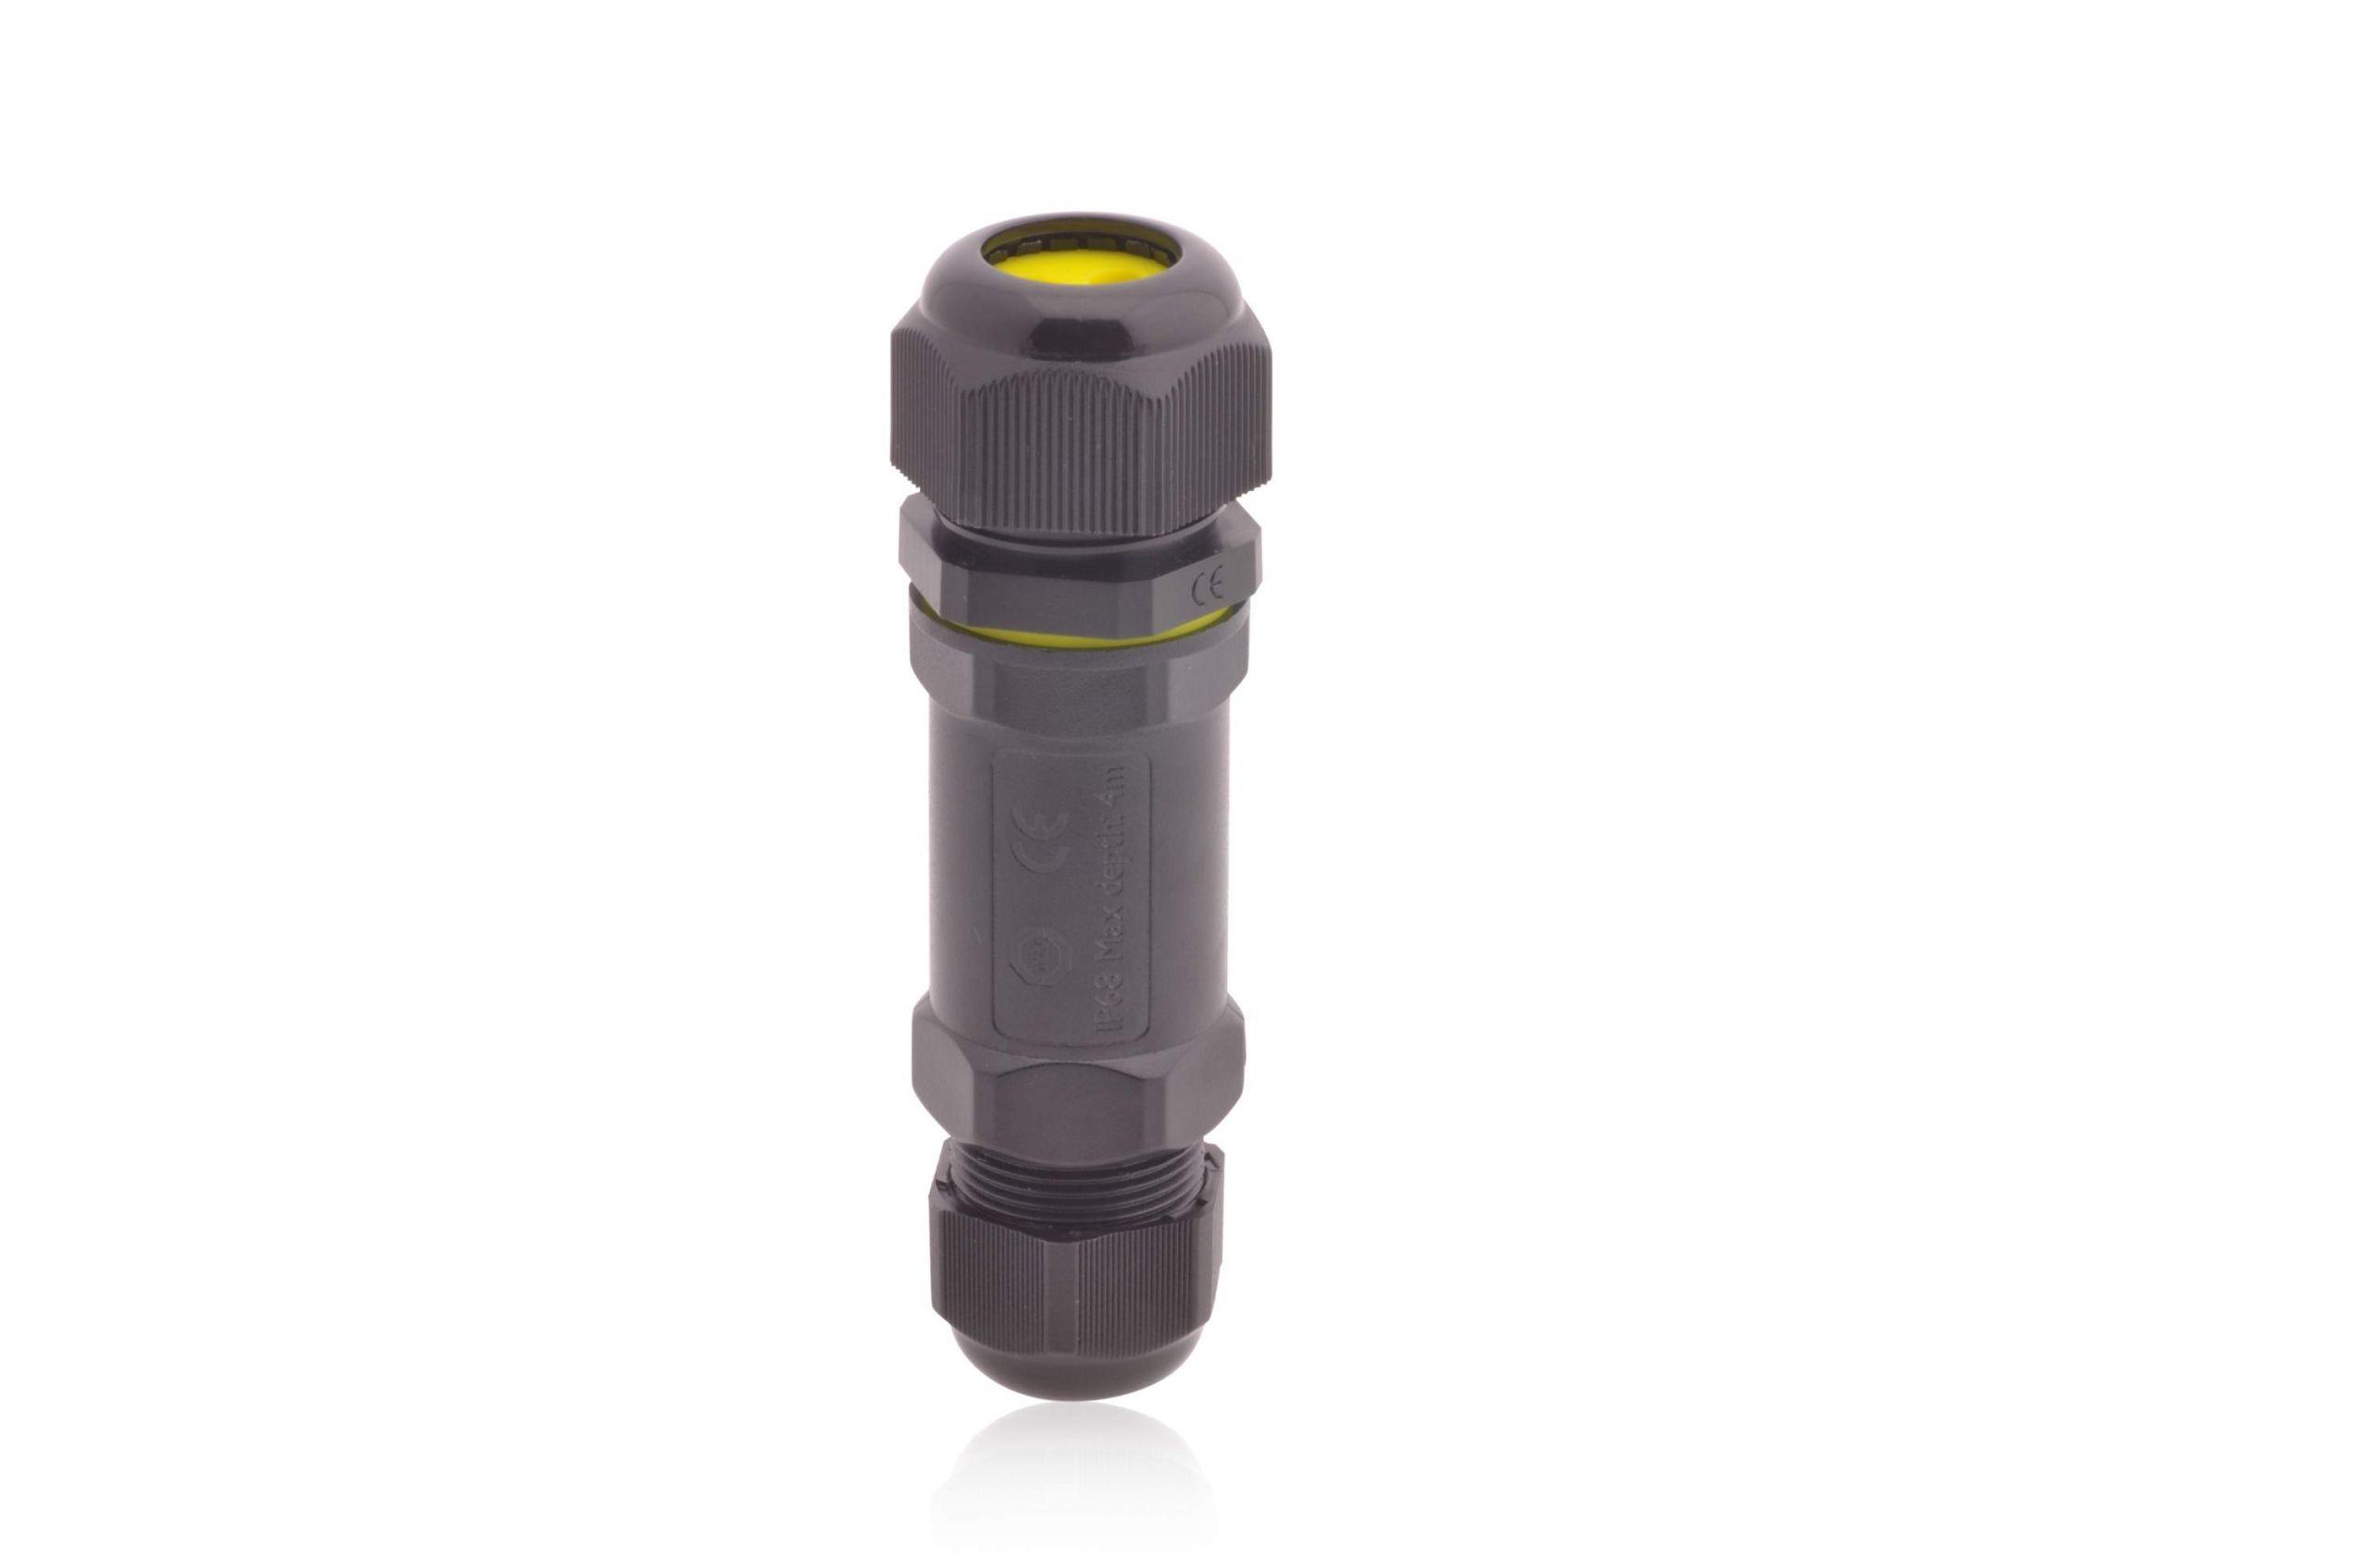 Intratec Geh use Serie Wasserdicht IP68 JSGH685 1 BikvsOvfrmuYg0m